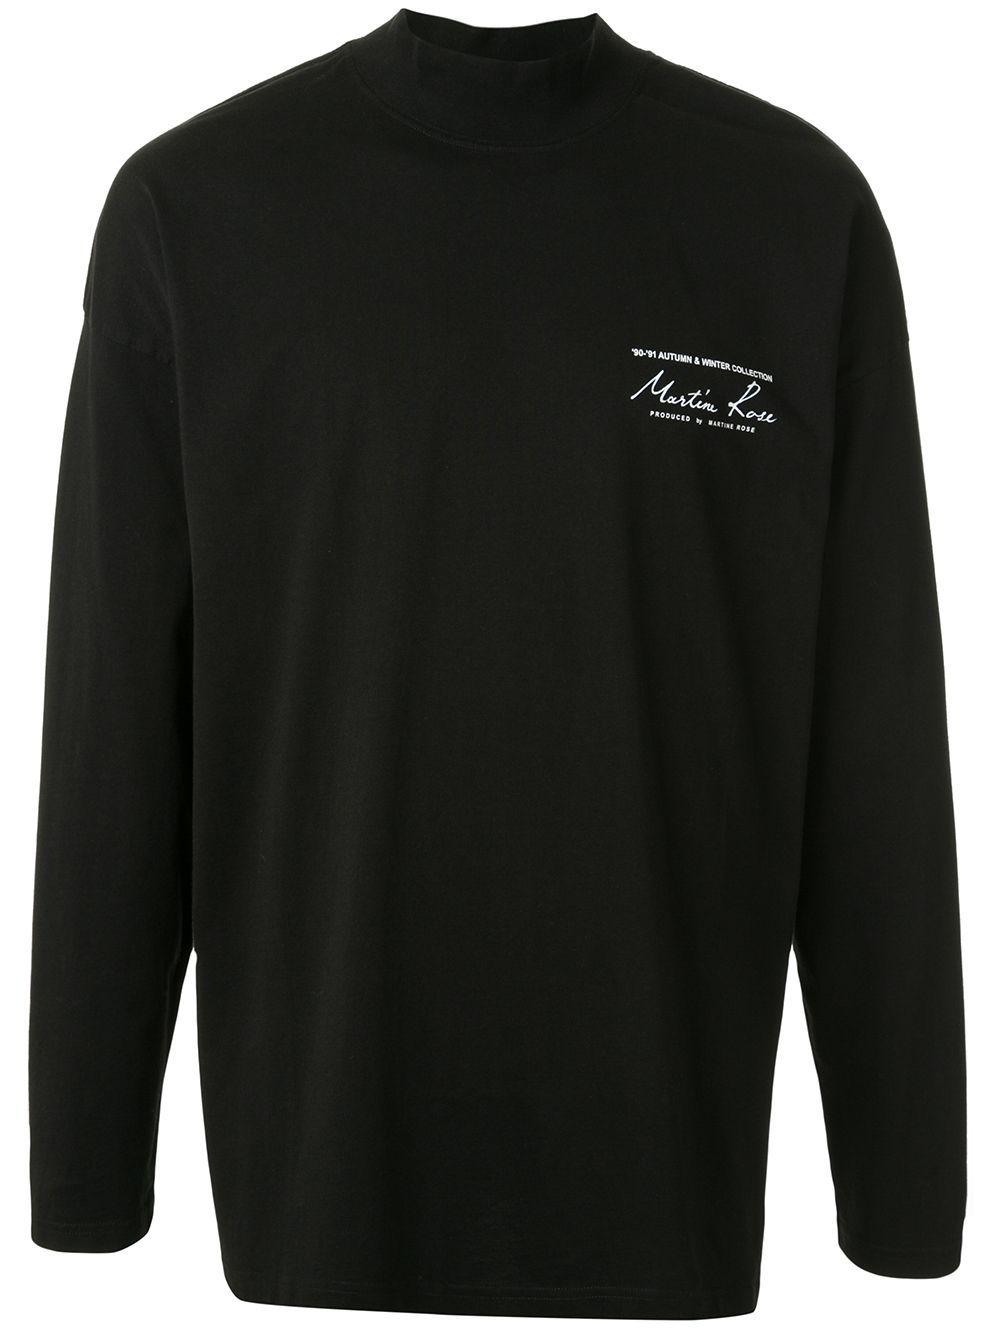 Martine Rose logo print T-shirt - Black in 2020 | T shirt, Cotton logo, Black cotton